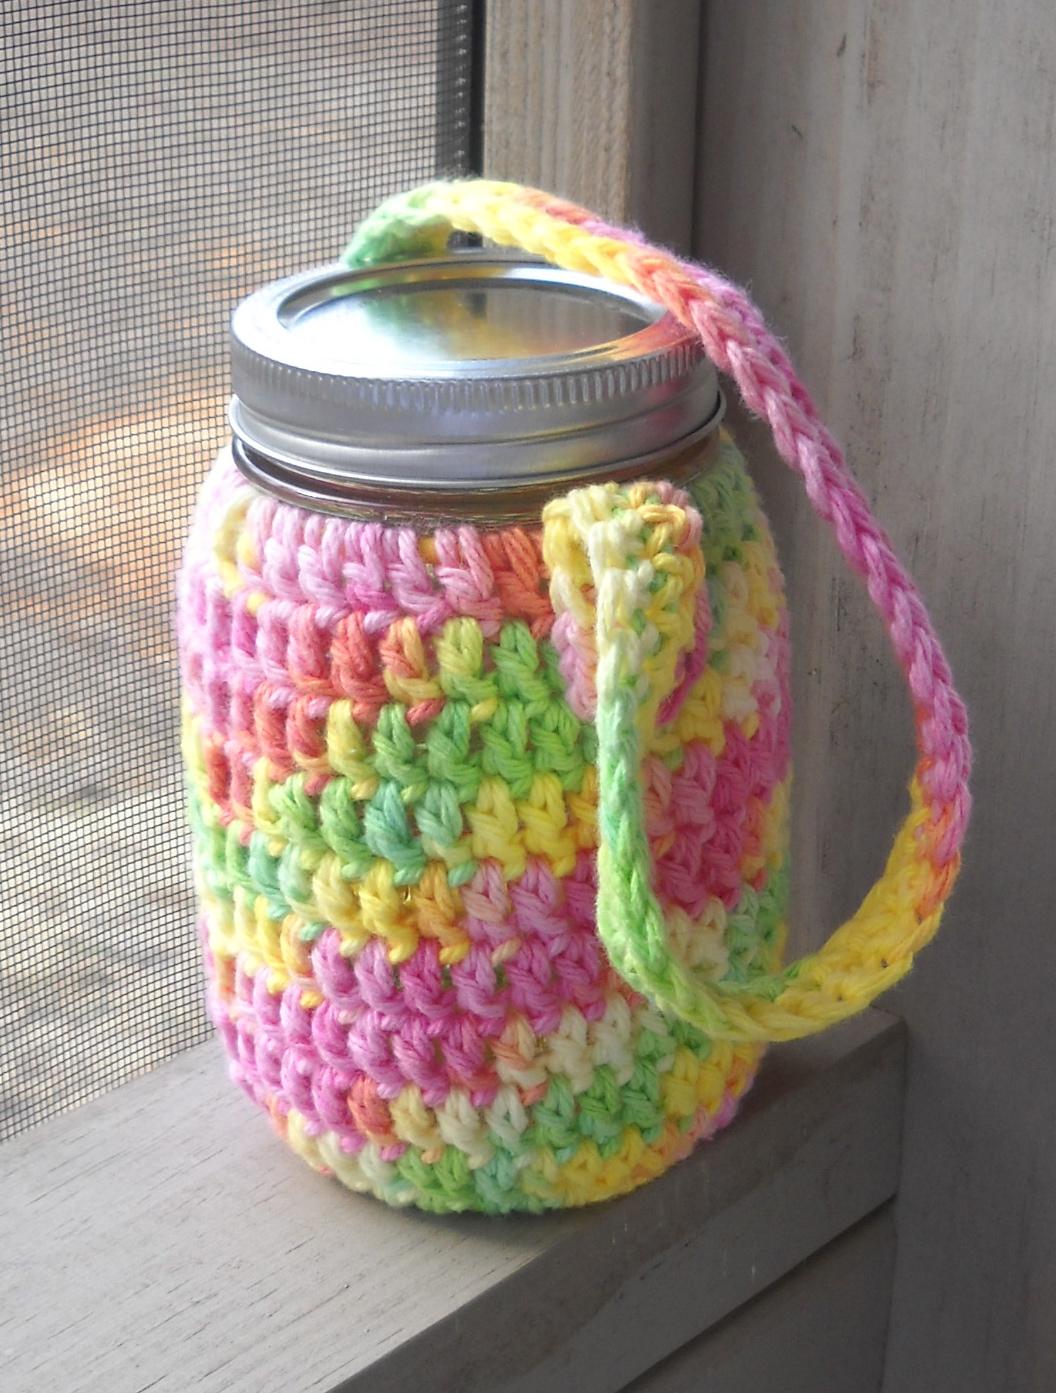 Confessions of a Sewciopath: water jar cozy